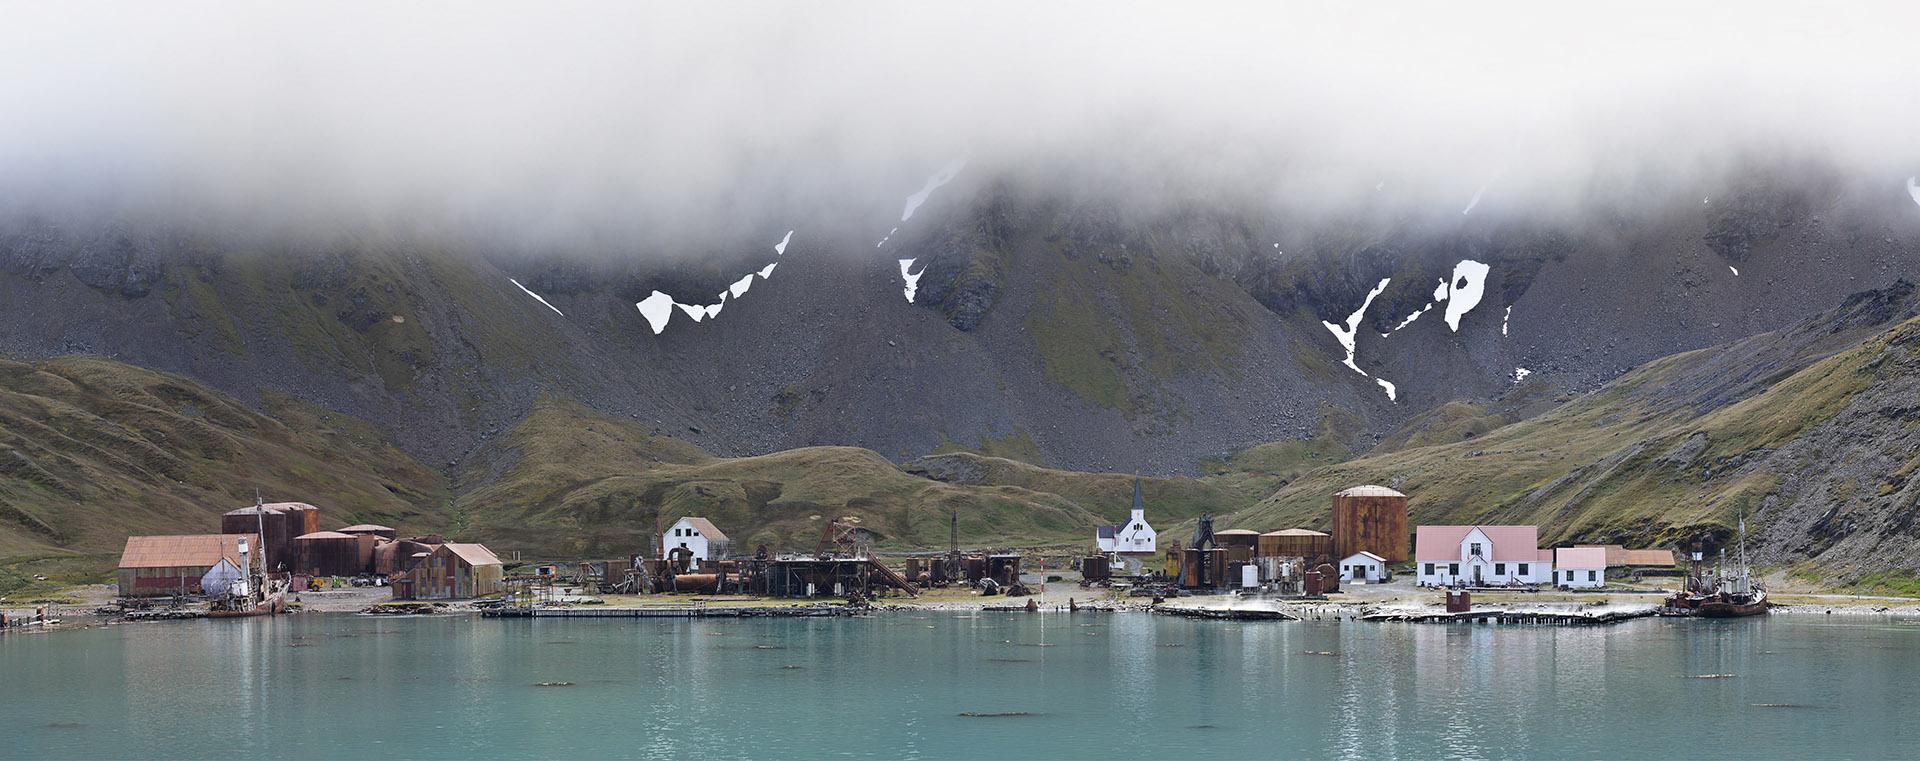 Grytviken, South Georgia<br/>